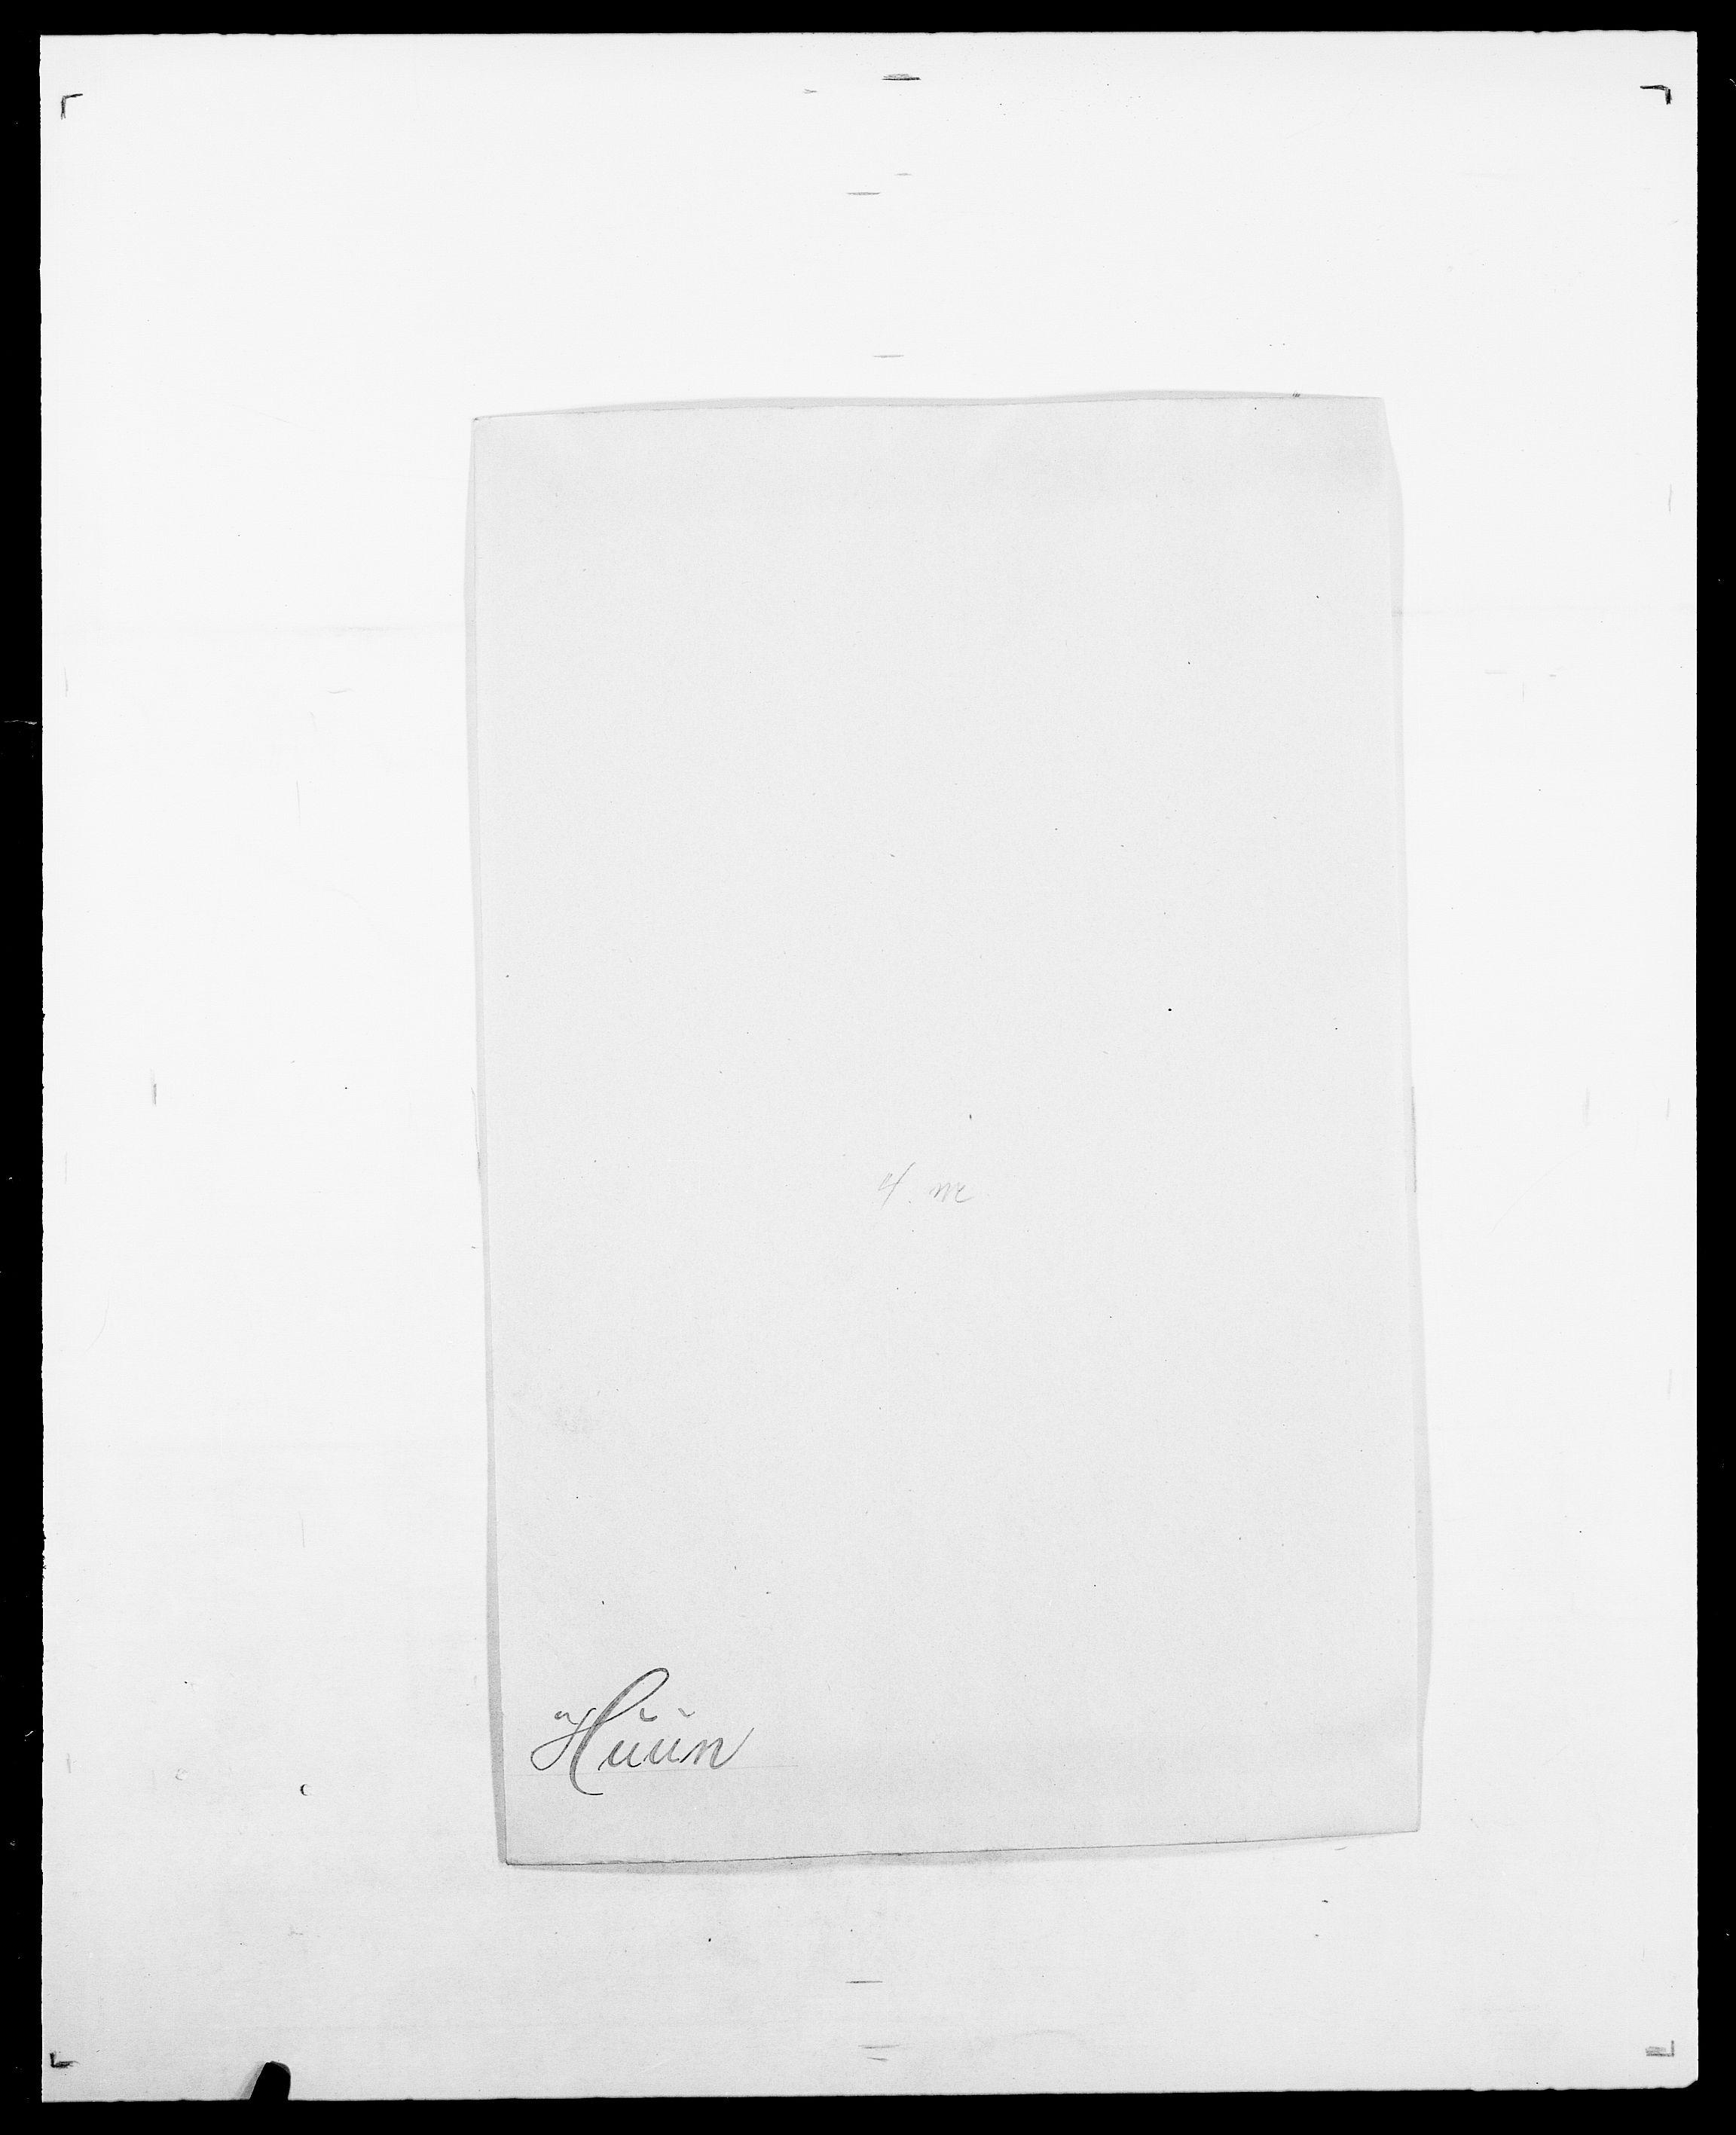 SAO, Delgobe, Charles Antoine - samling, D/Da/L0019: van der Hude - Joys, s. 96